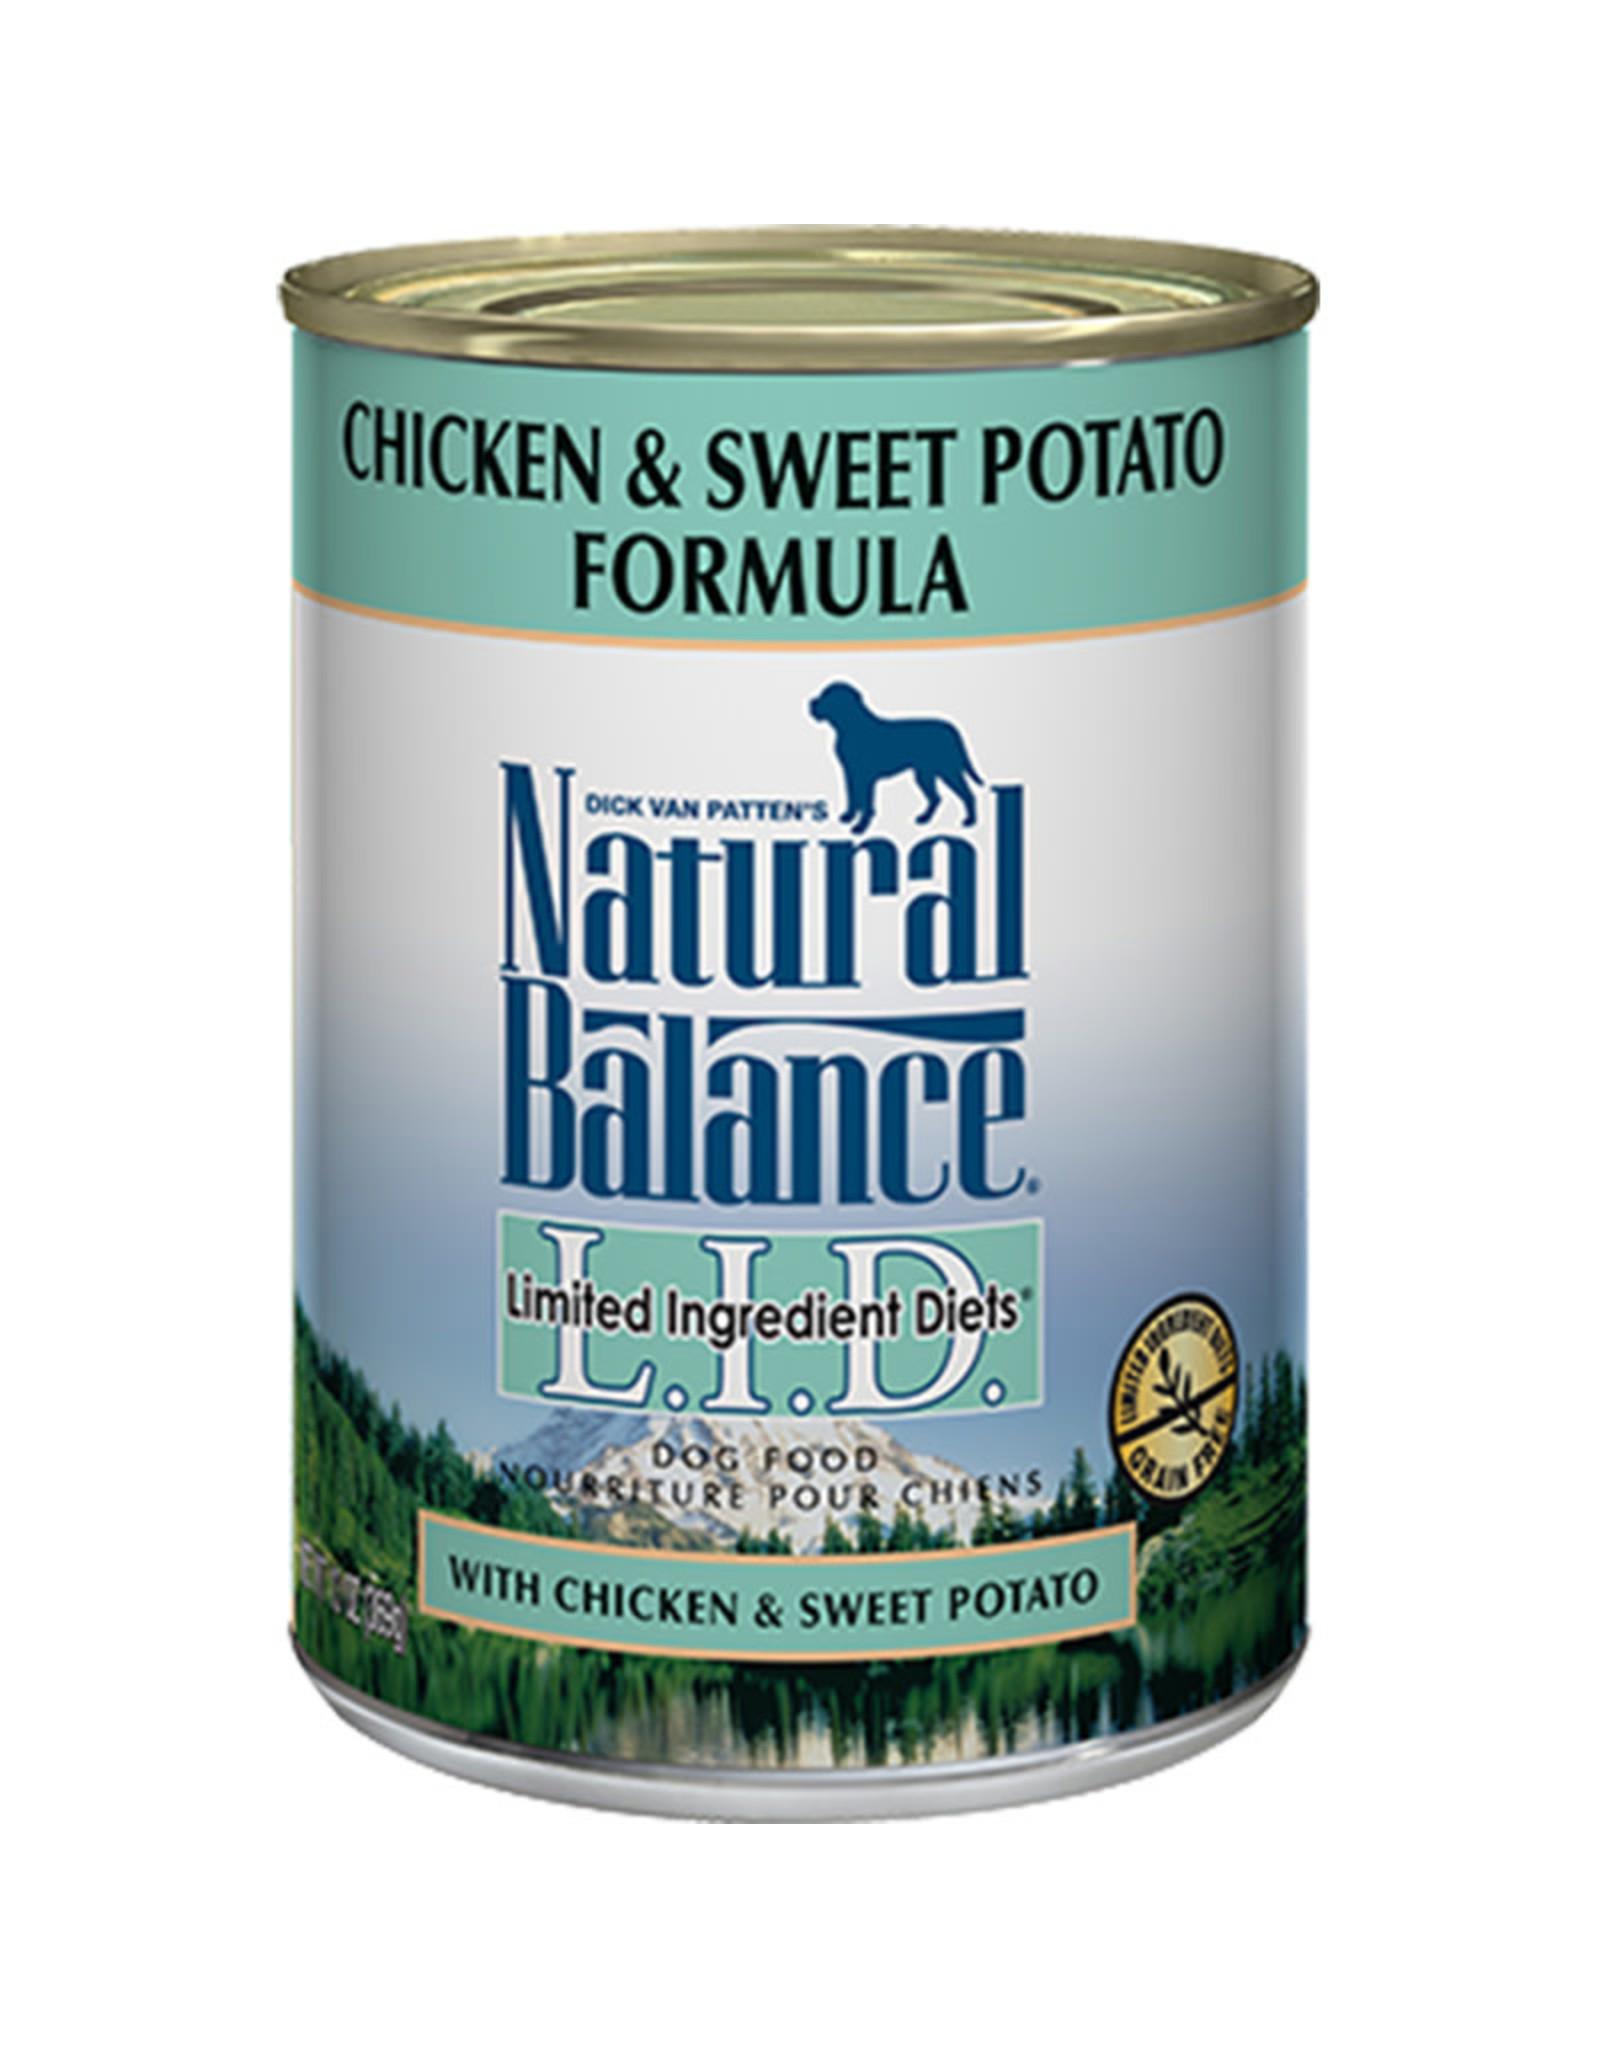 Natural Balance Natural Balance chicken sweet potato 13oz dog